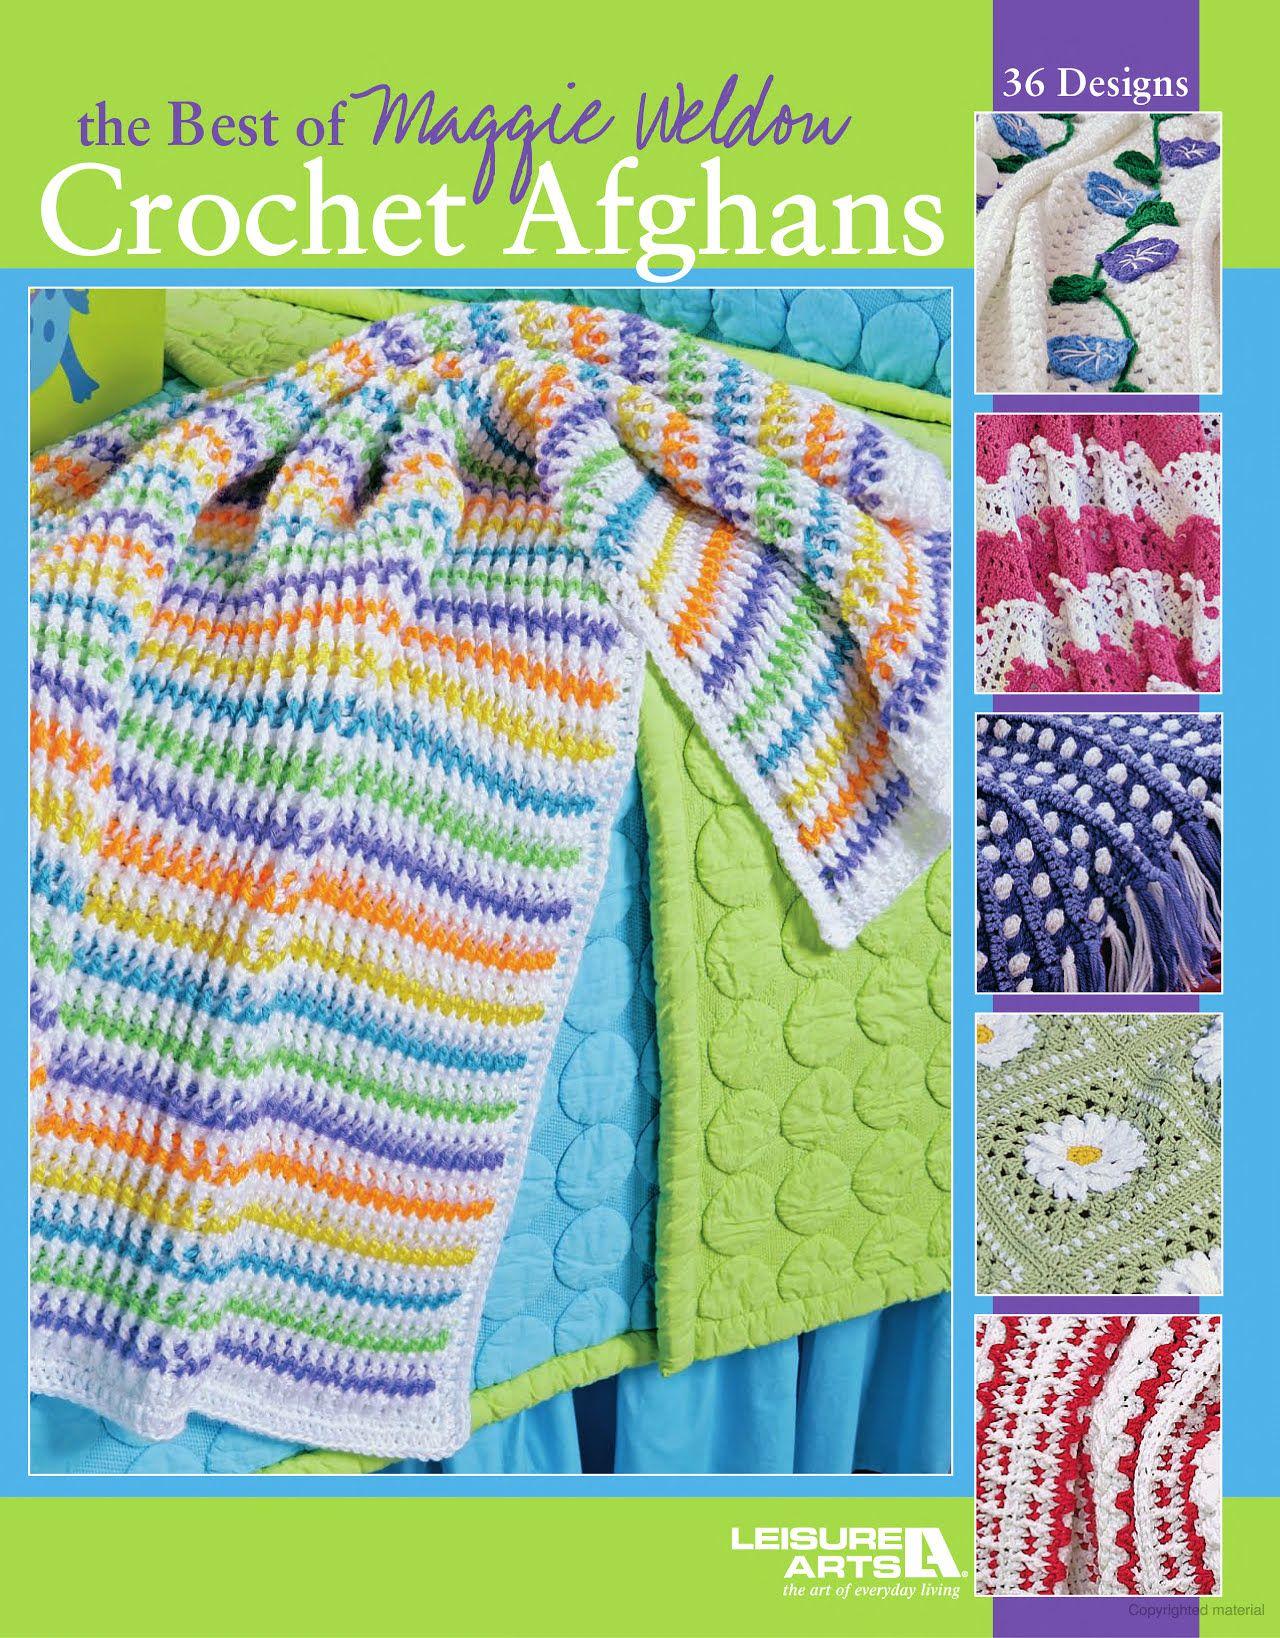 Famoso Ondulación Amor Patrón De Crochet Afghan Ilustración - Manta ...